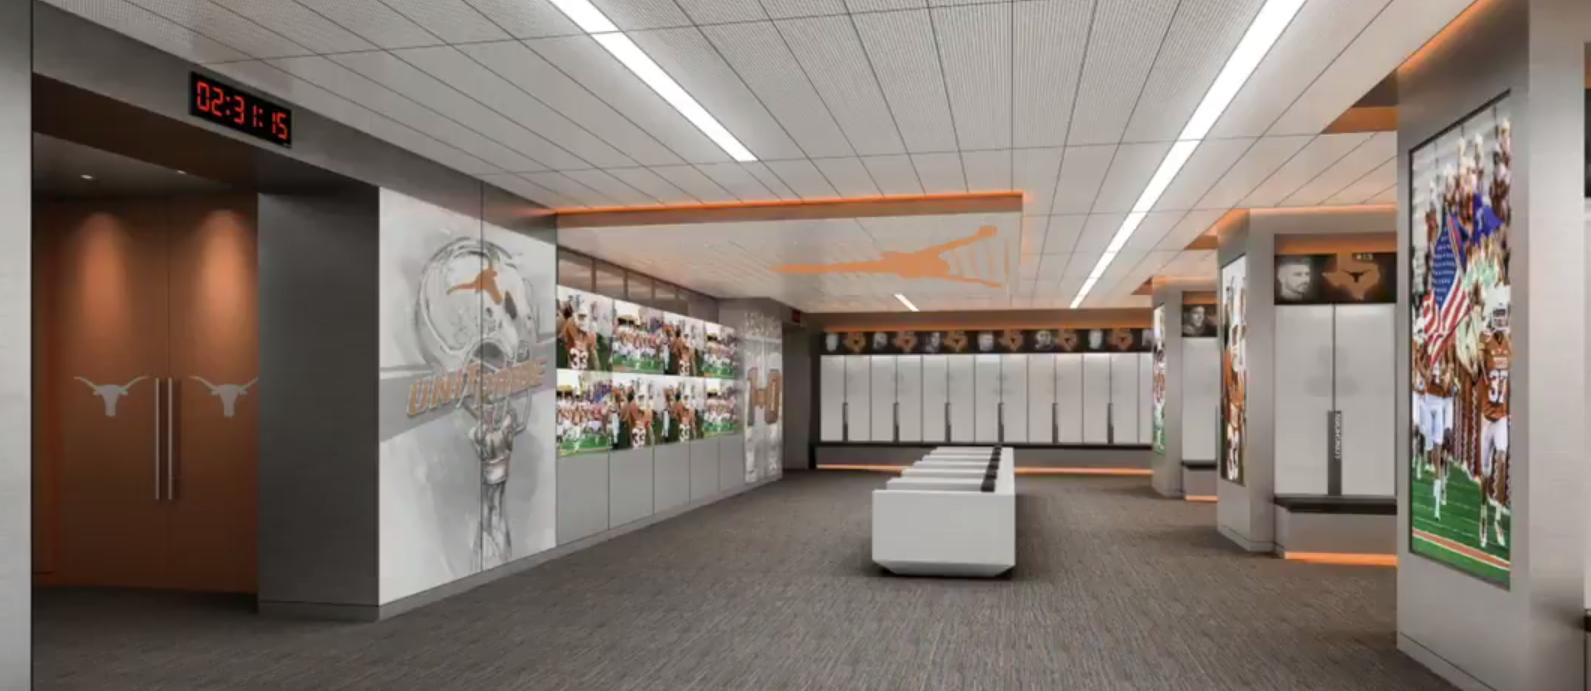 Texas Unveils Impressive Rendering Of New Locker Room